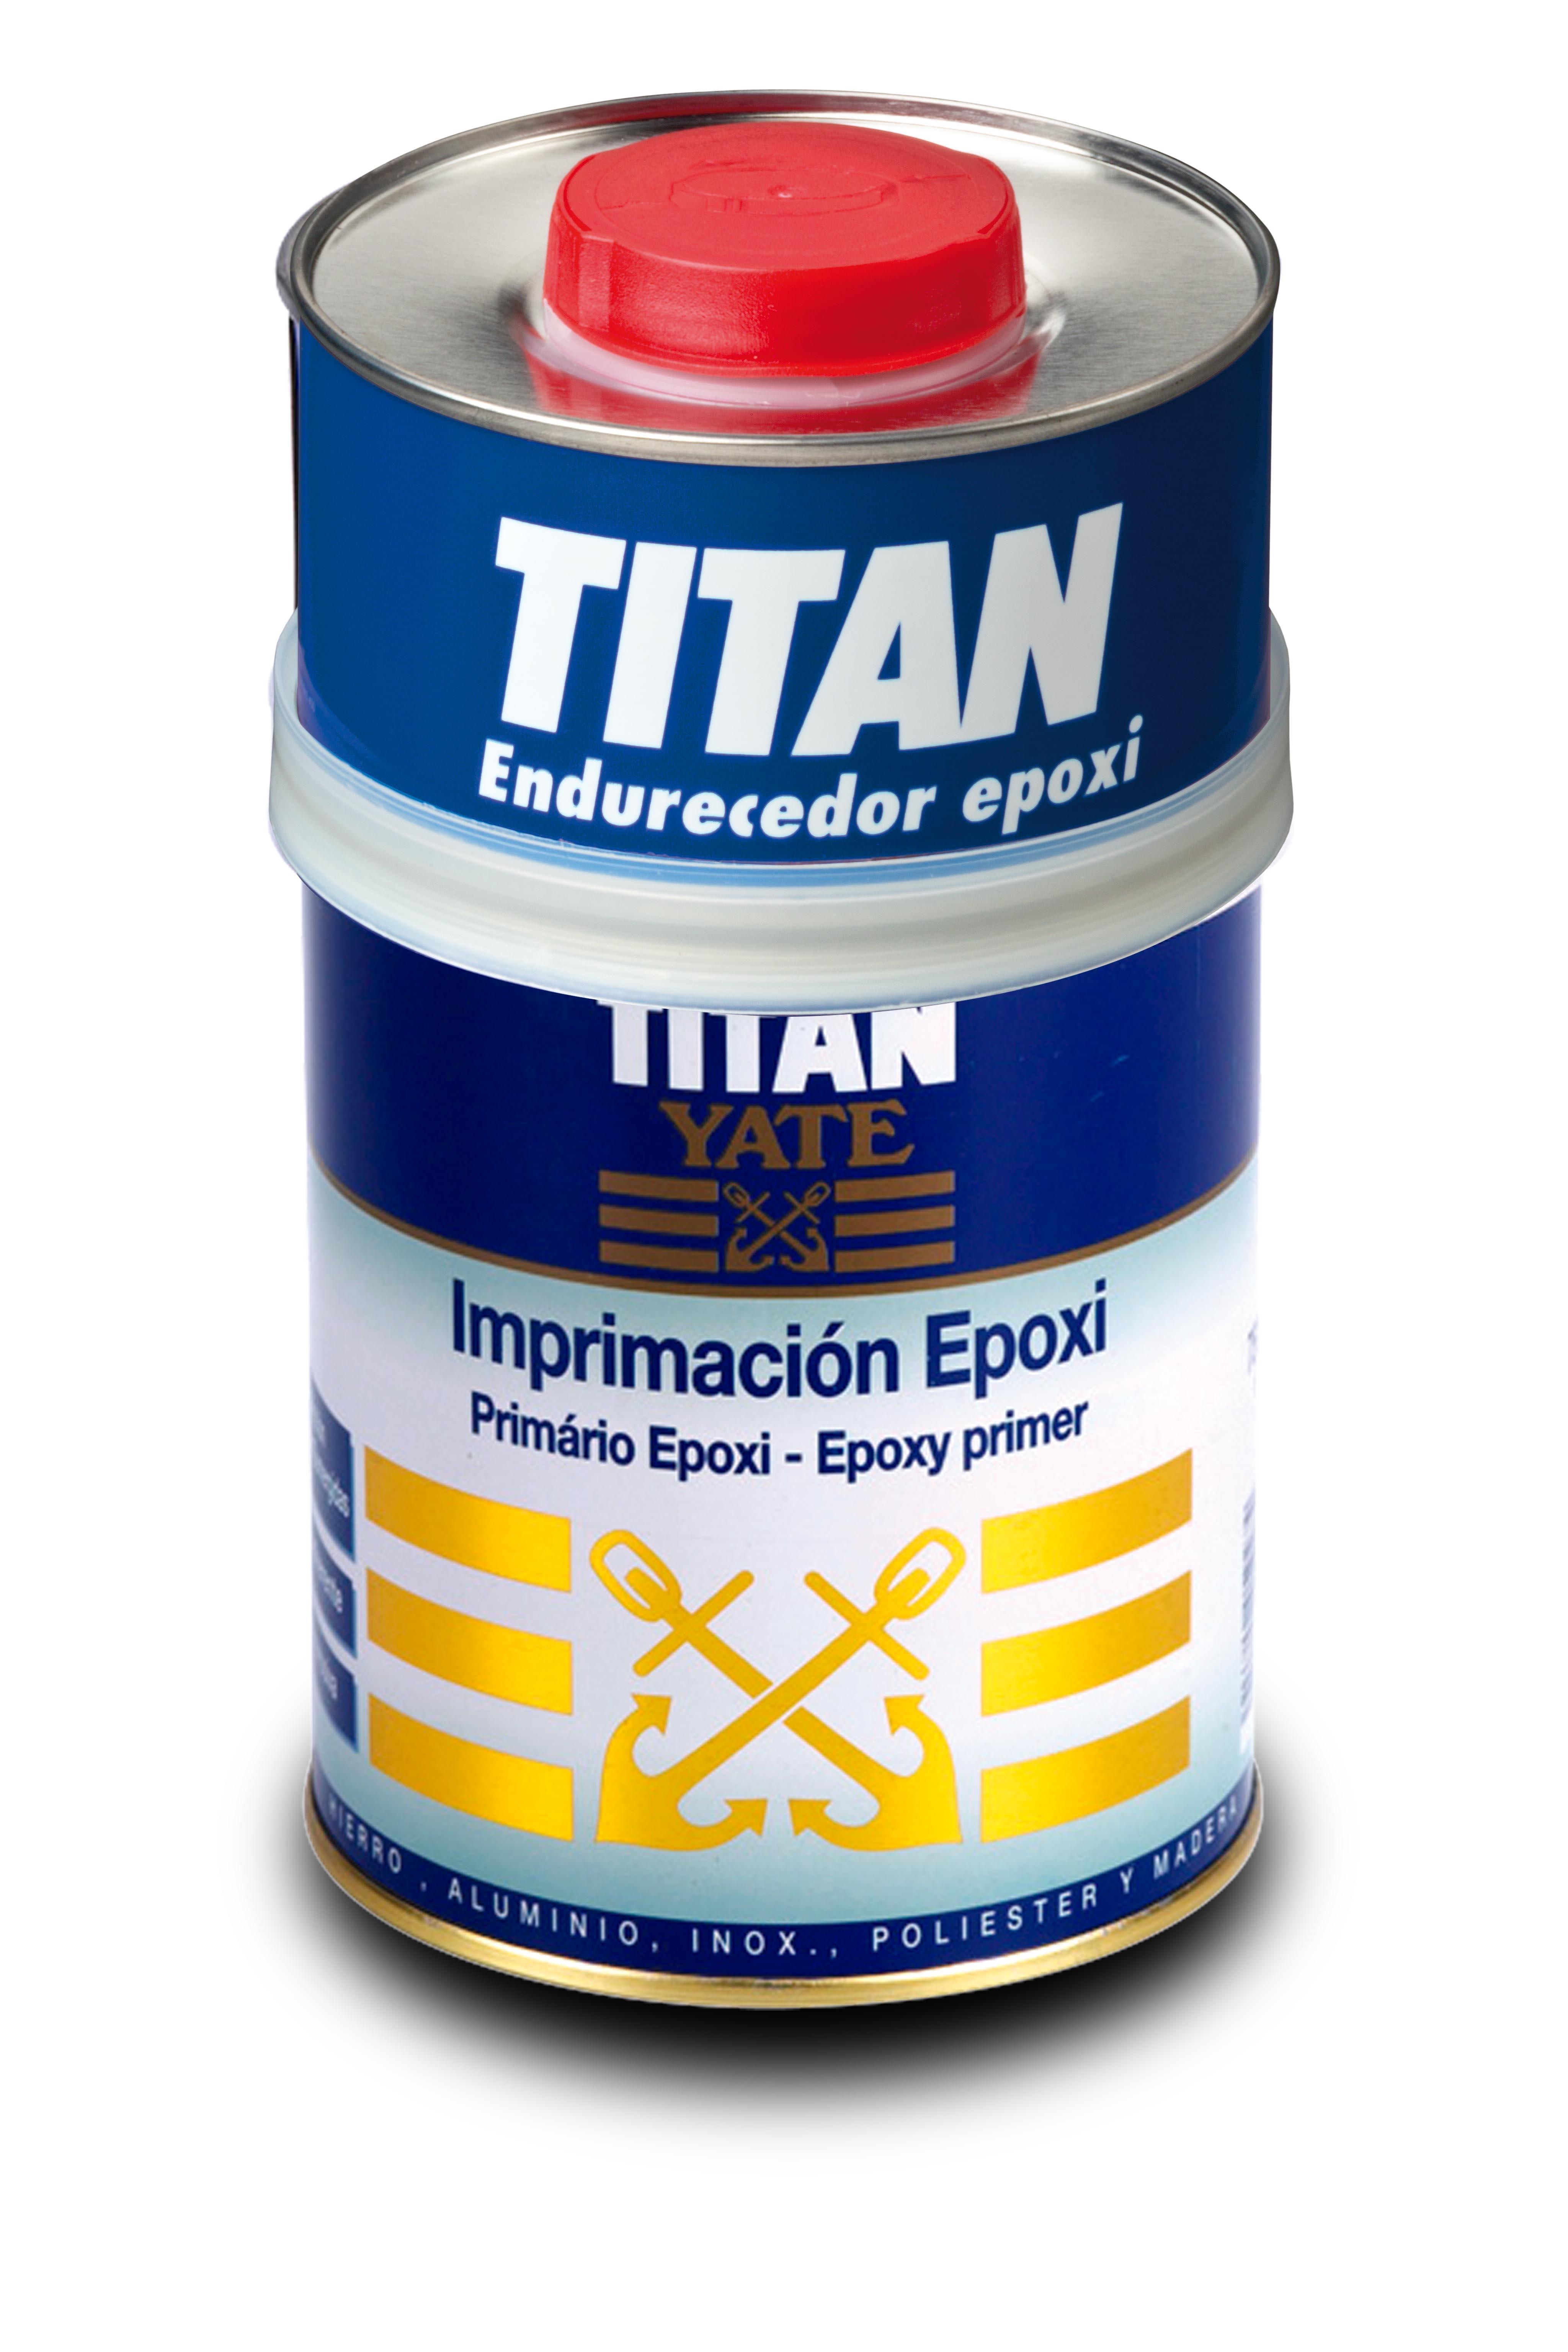 Producto TITAN